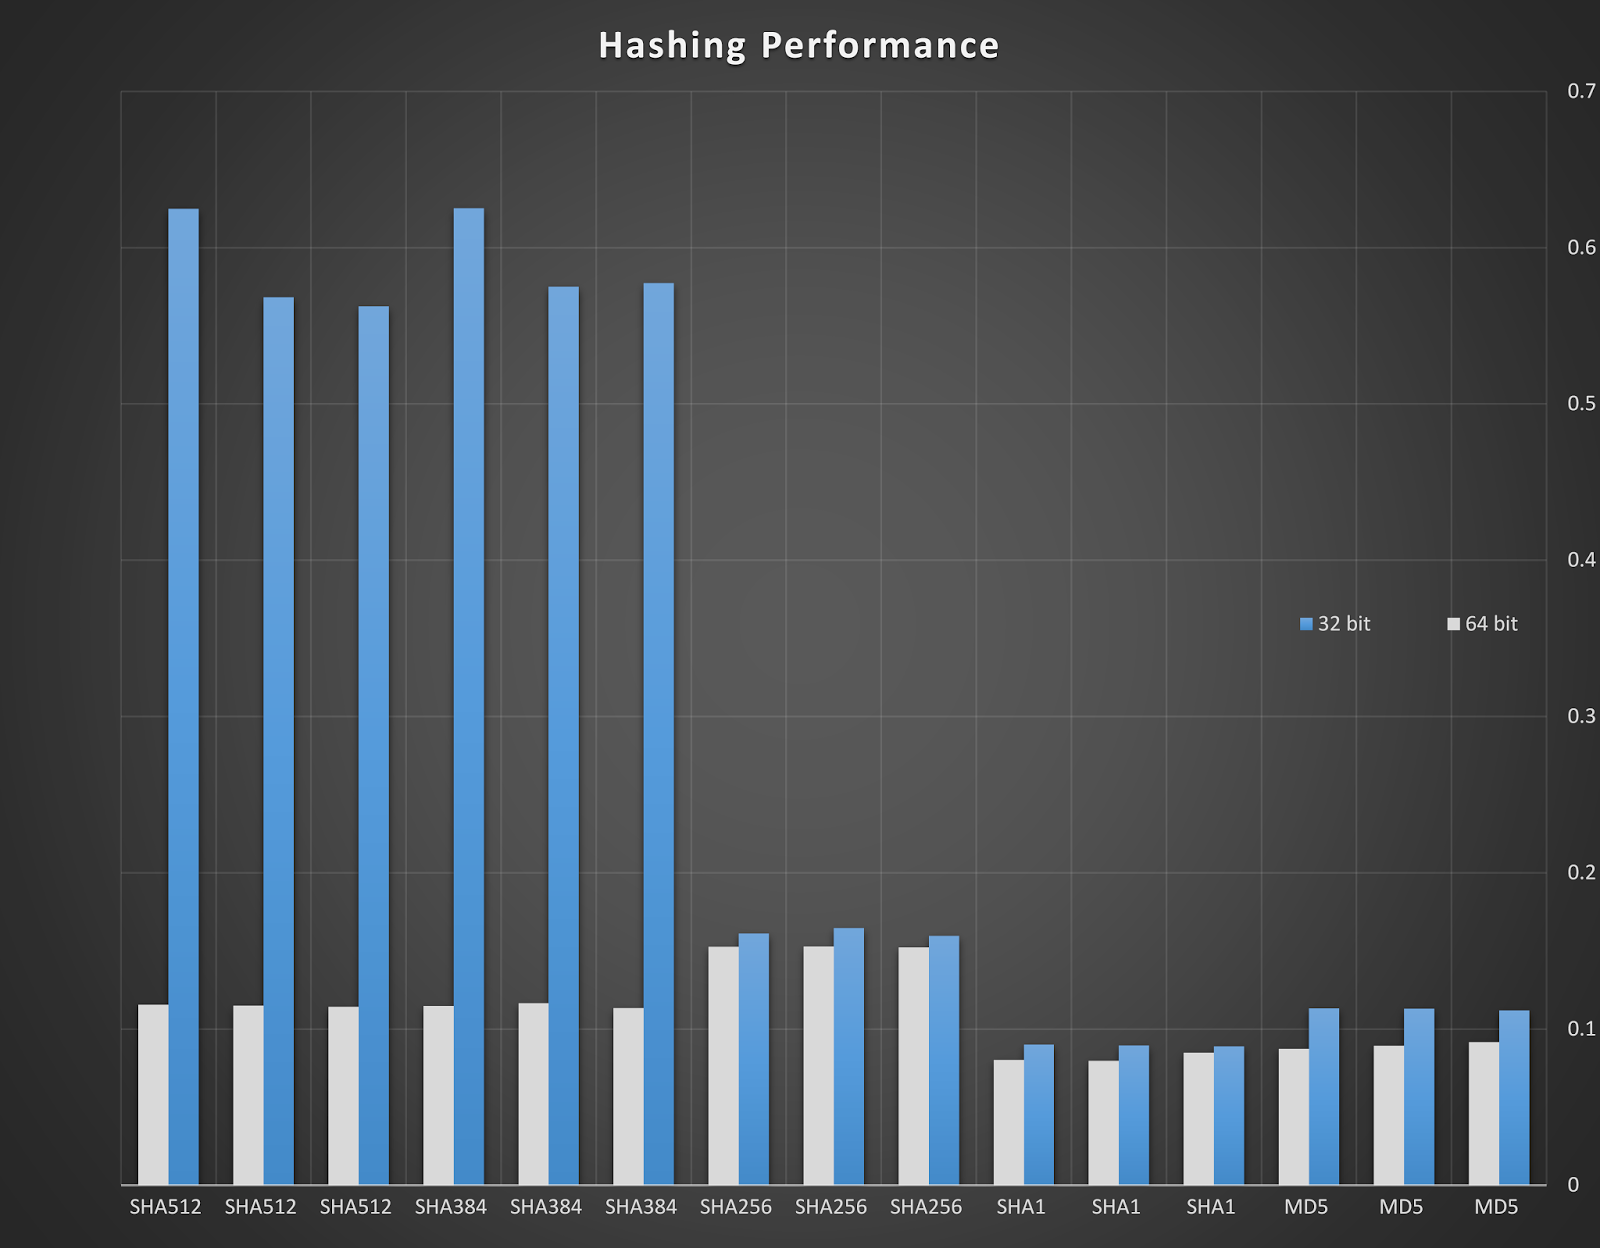 Voix Security: Performance of MD5, SHA1, SHA256, SHA384, and SHA512